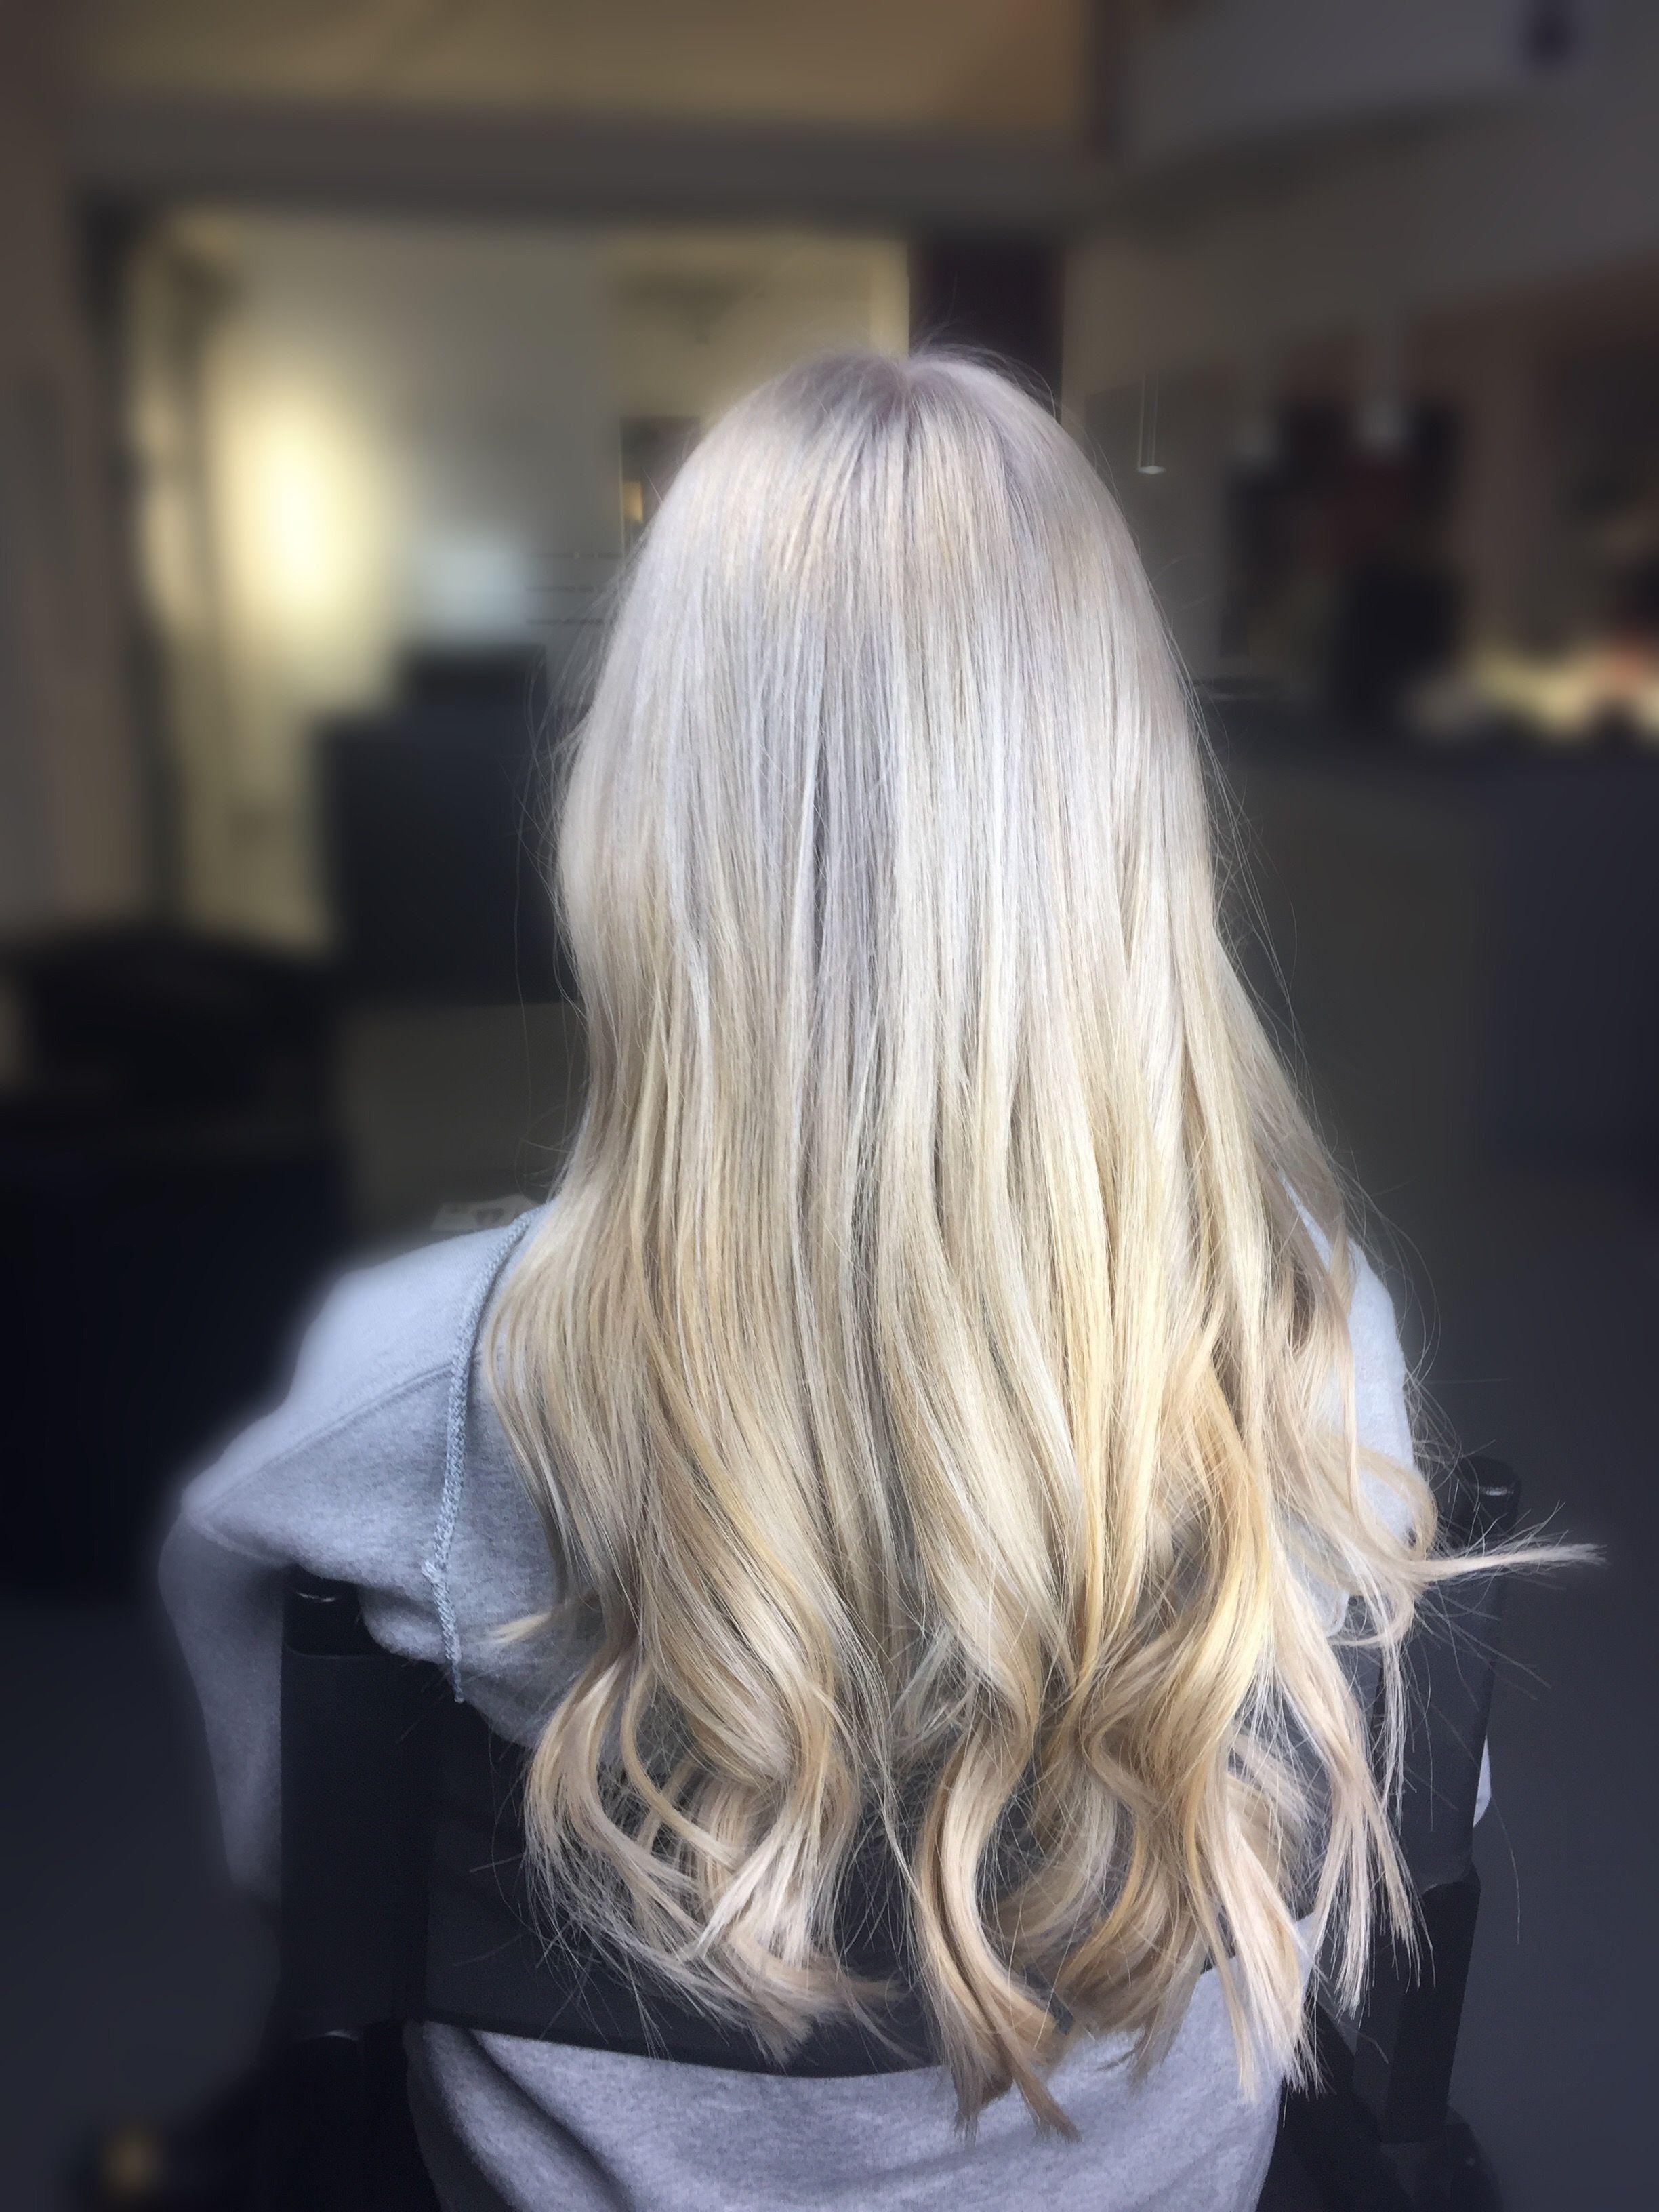 My hair ❤ #silverblond